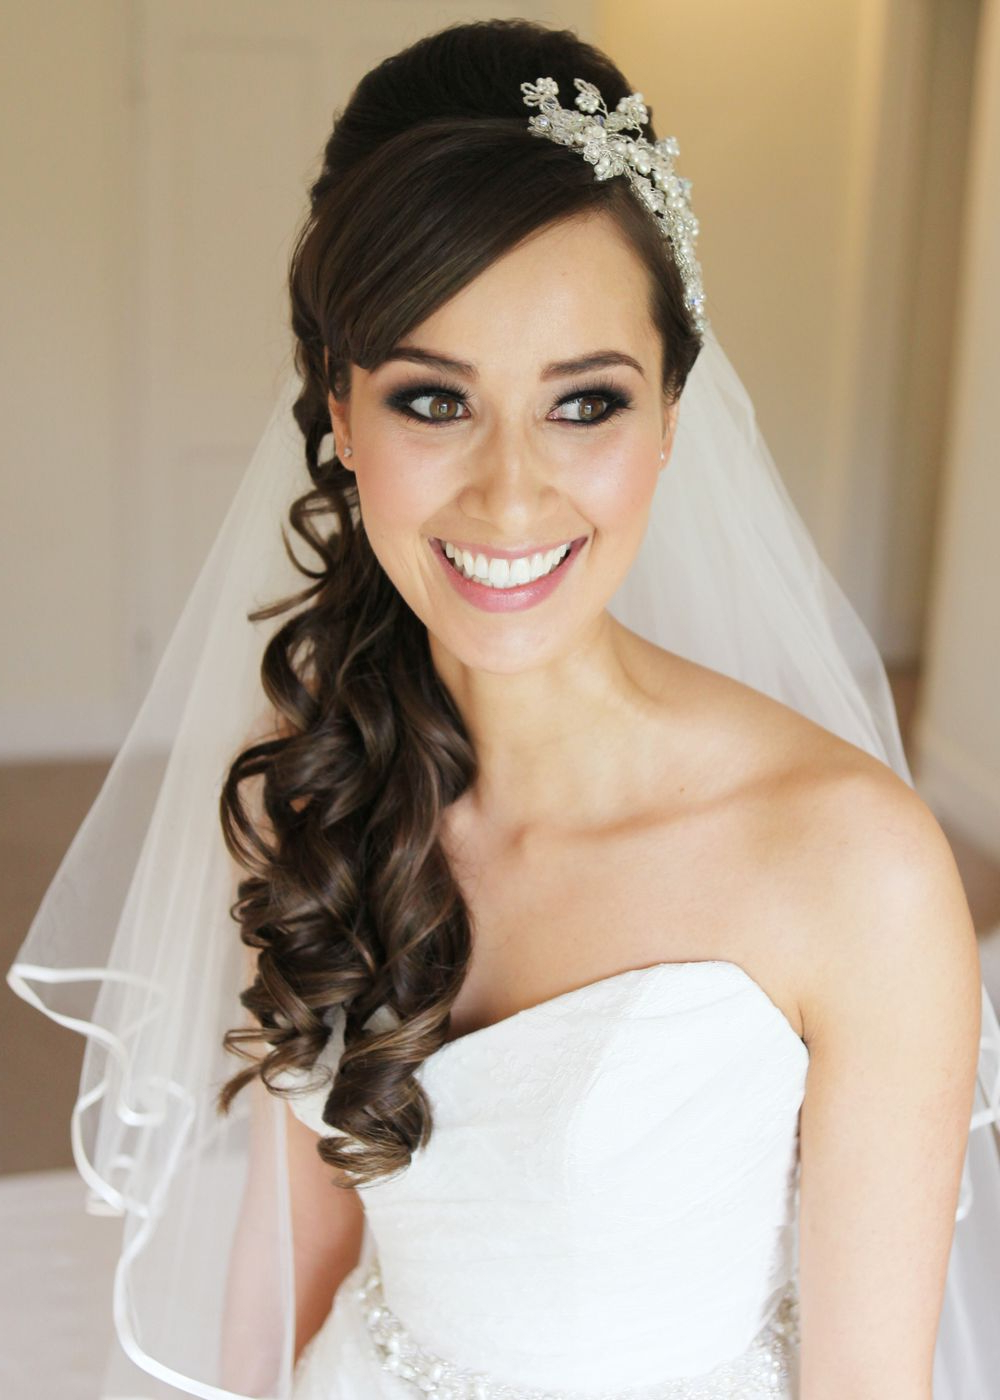 15 Fabulous Half Up Half Down Wedding Hairstyles (Gallery 7 of 20)